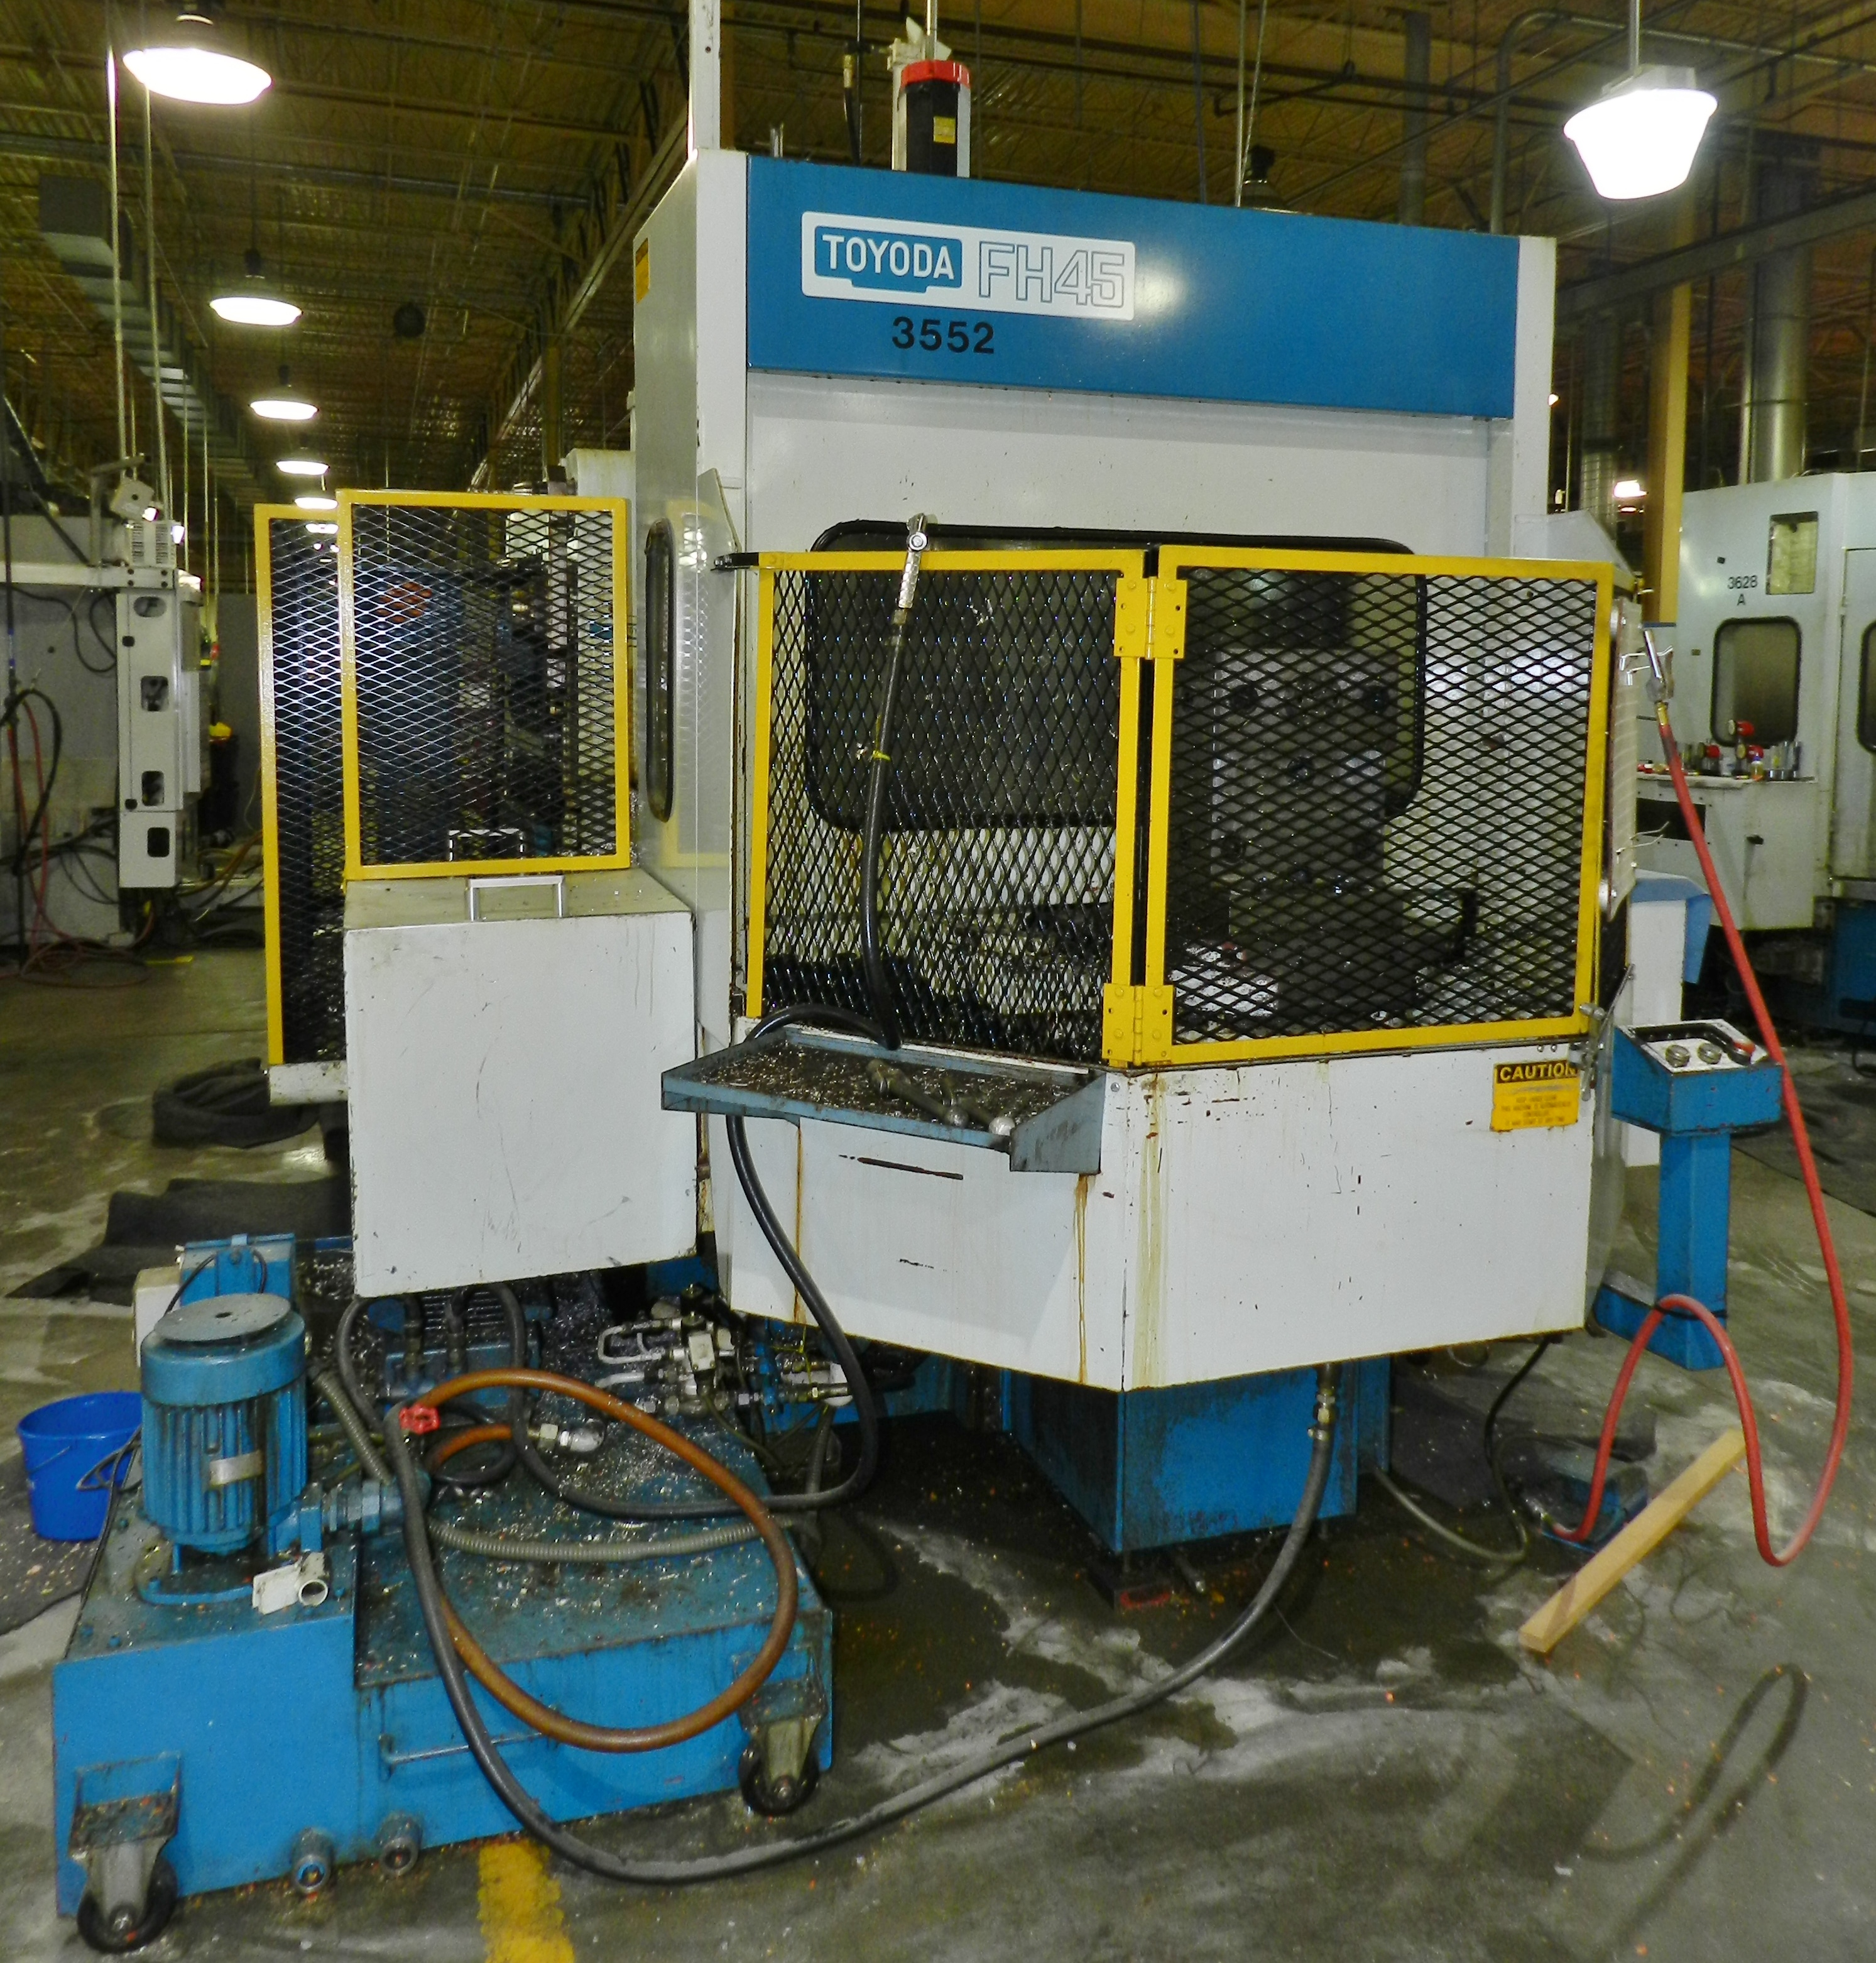 Lot 19 - Toyoda FH-45 Horizontal Machining Center